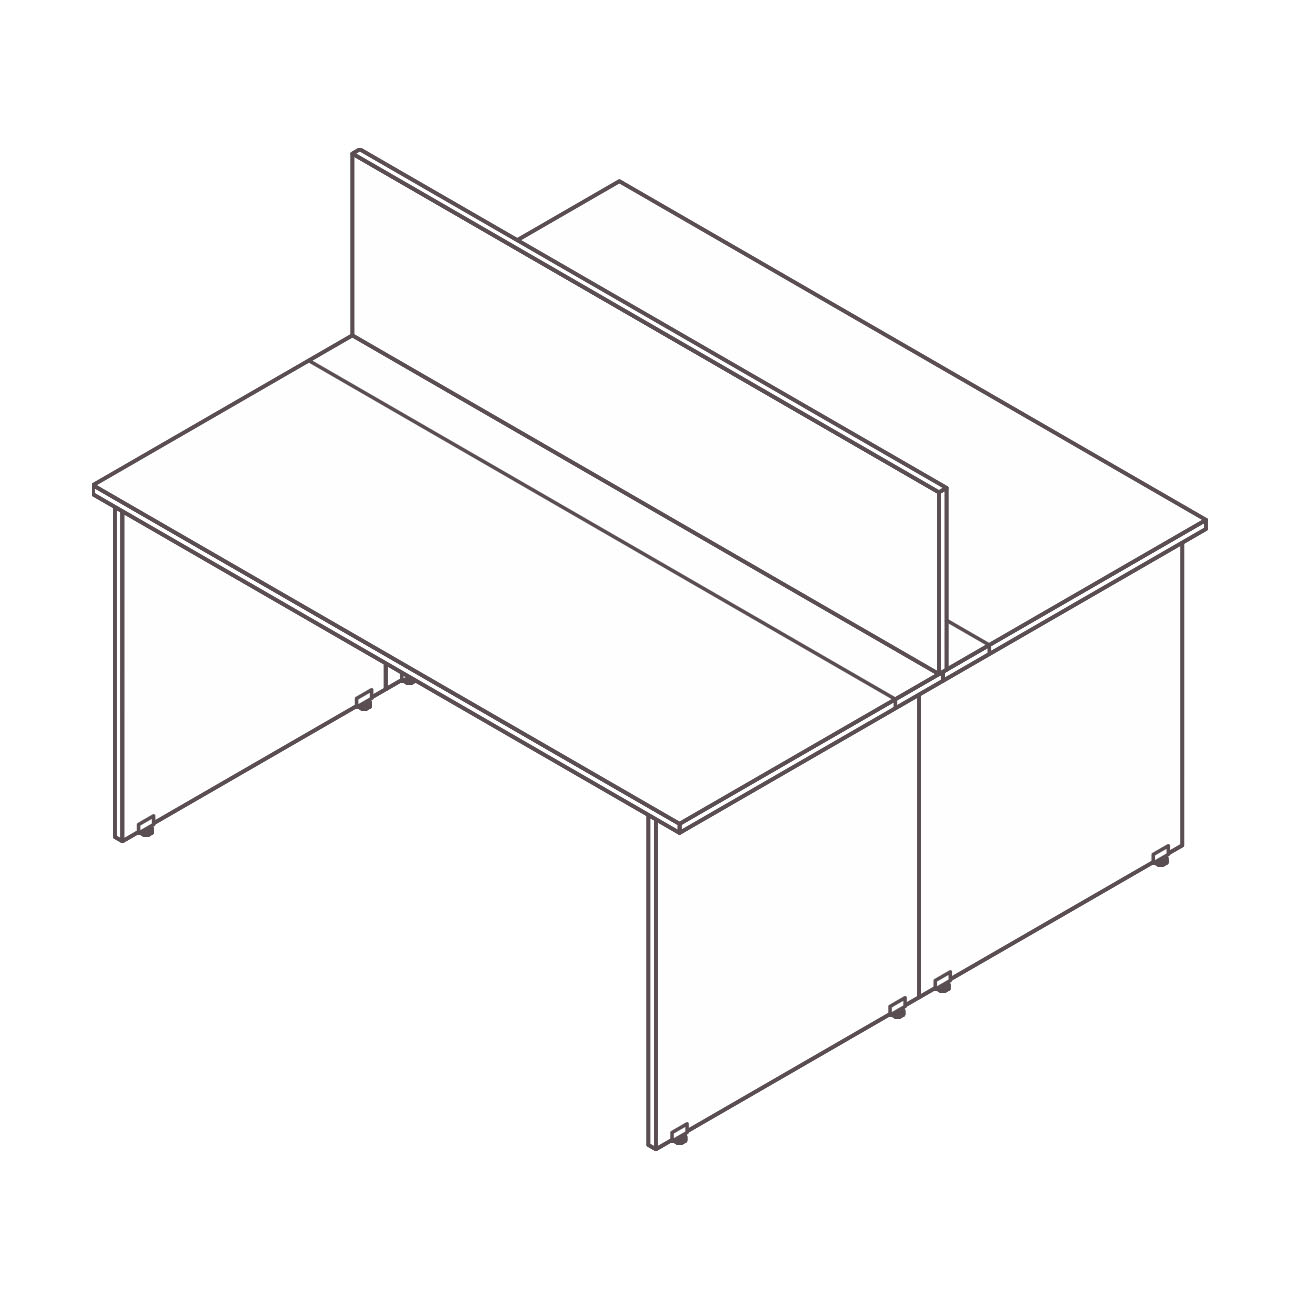 Mesa plataforma (passa fio / tomada) diamante